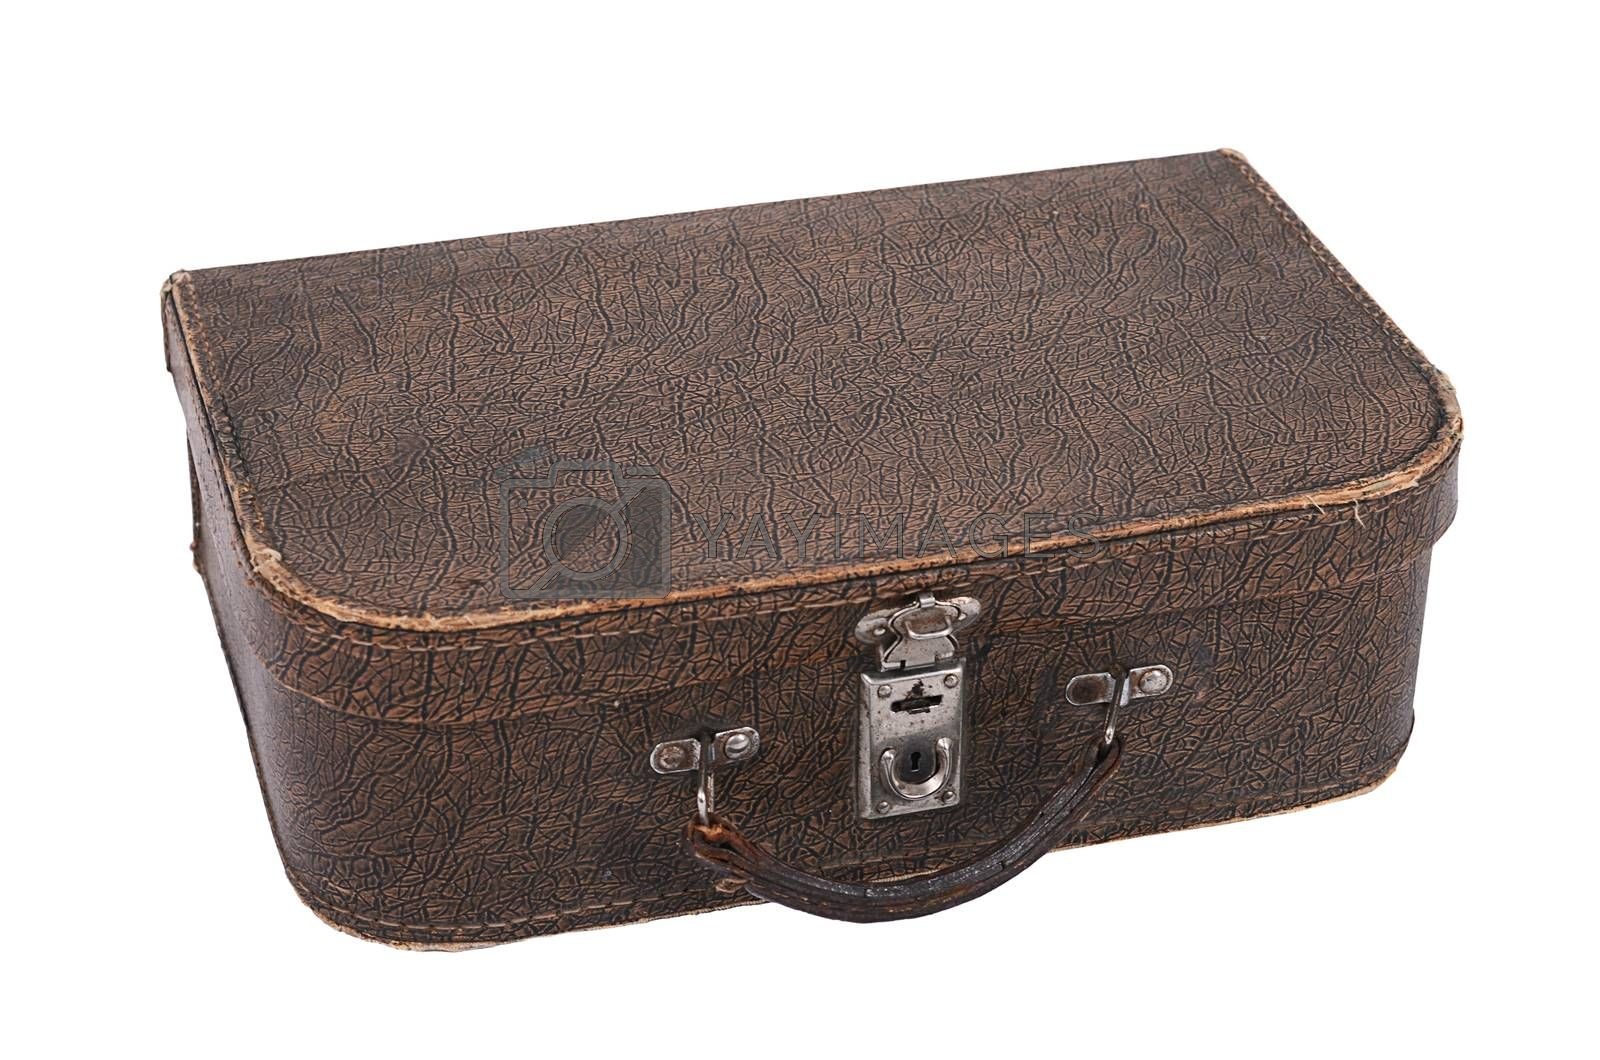 Royalty free image of Old suitcase isolated on white background by SvetaVo